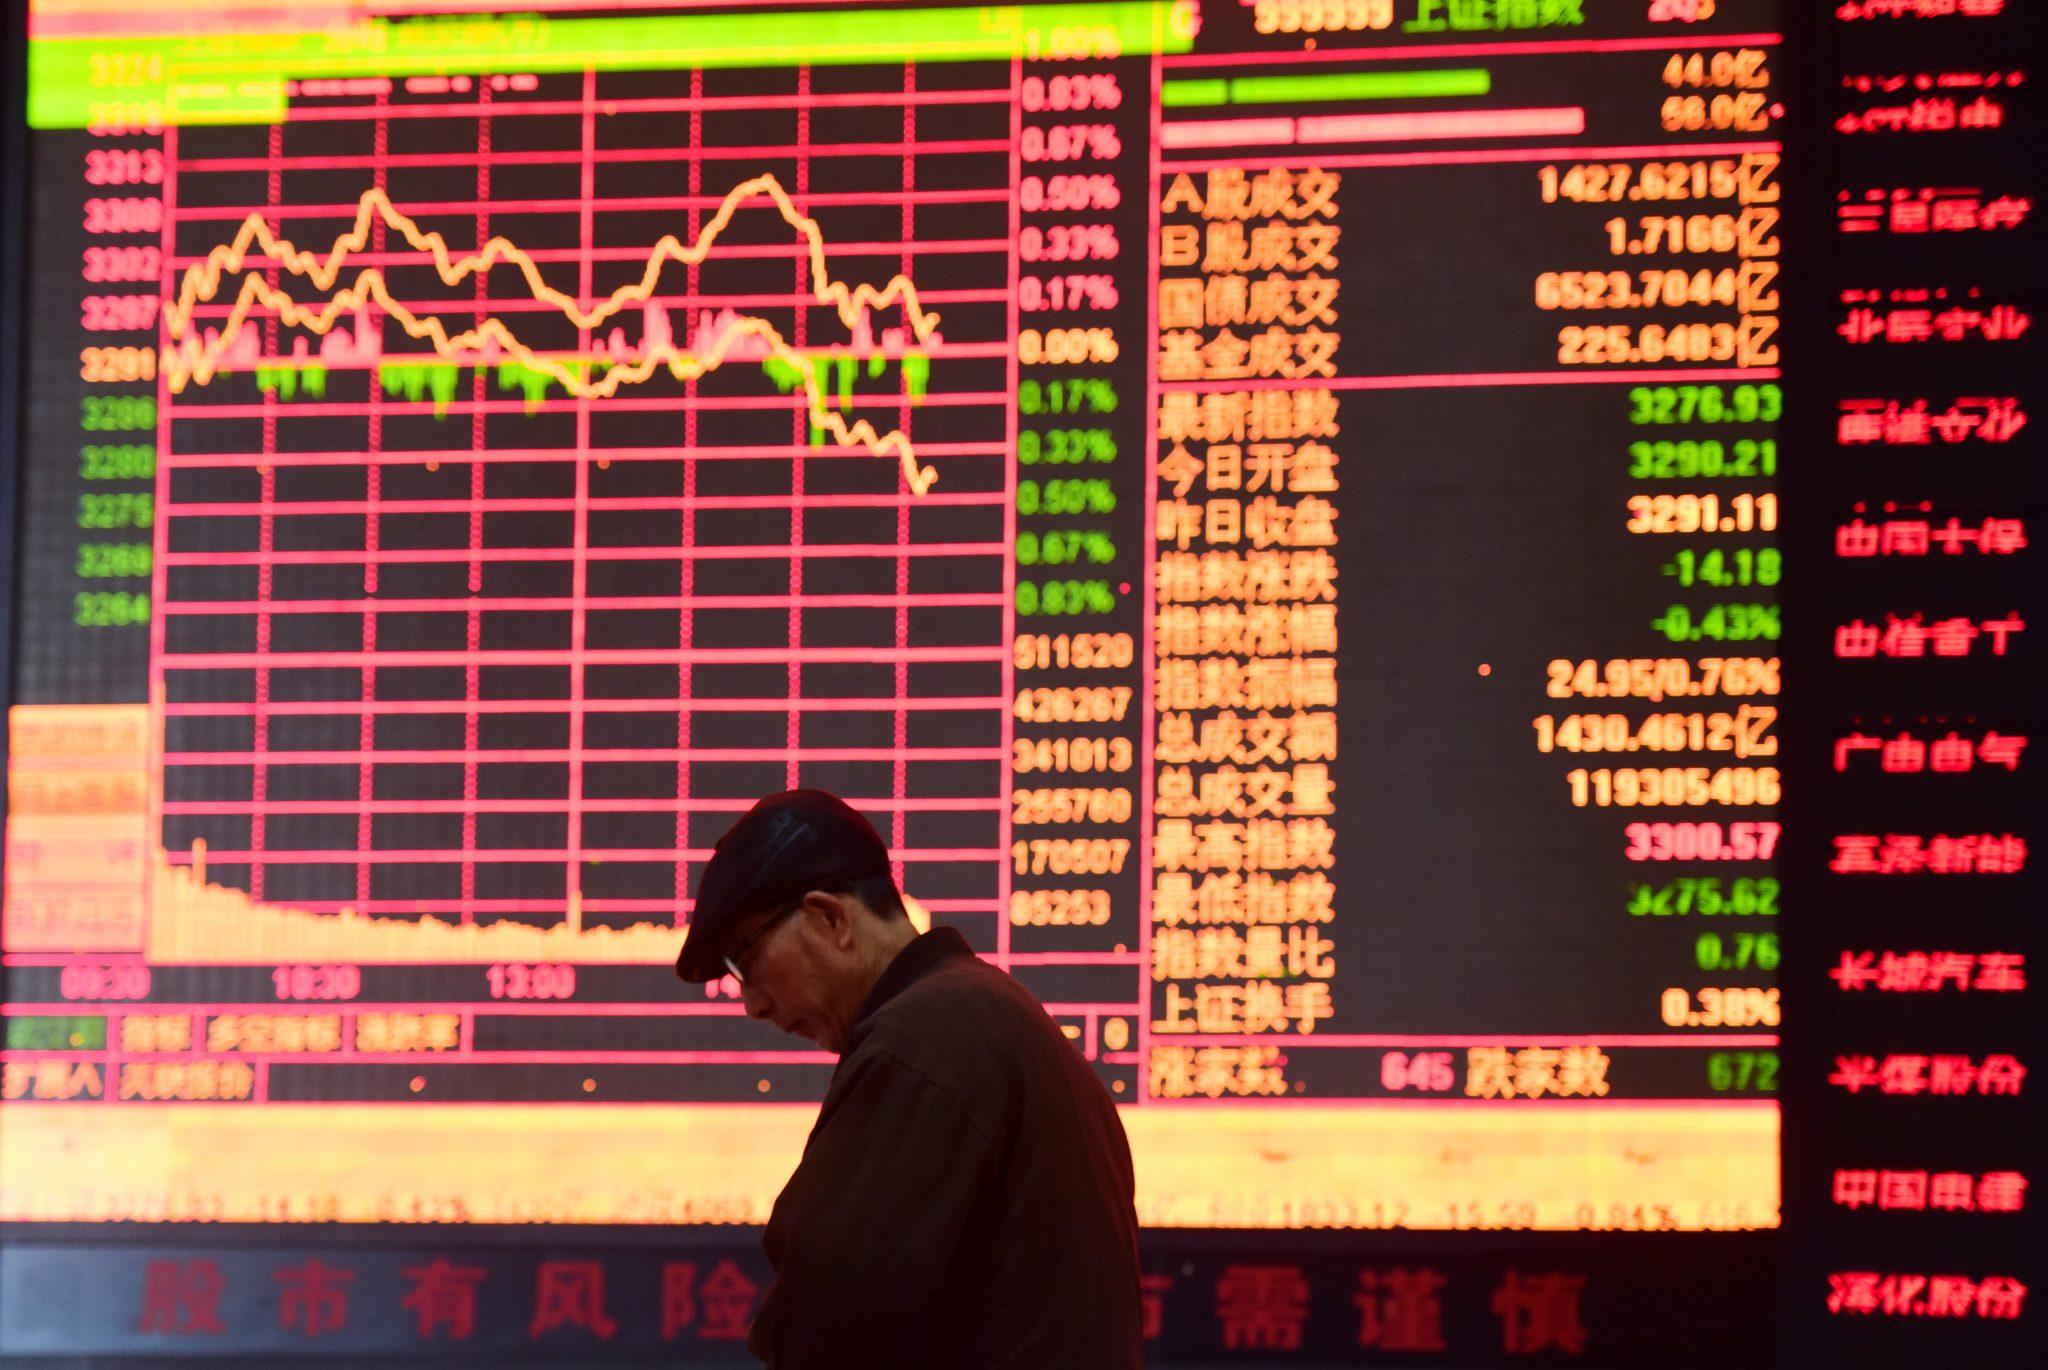 Rebuilding trust in the global economic system